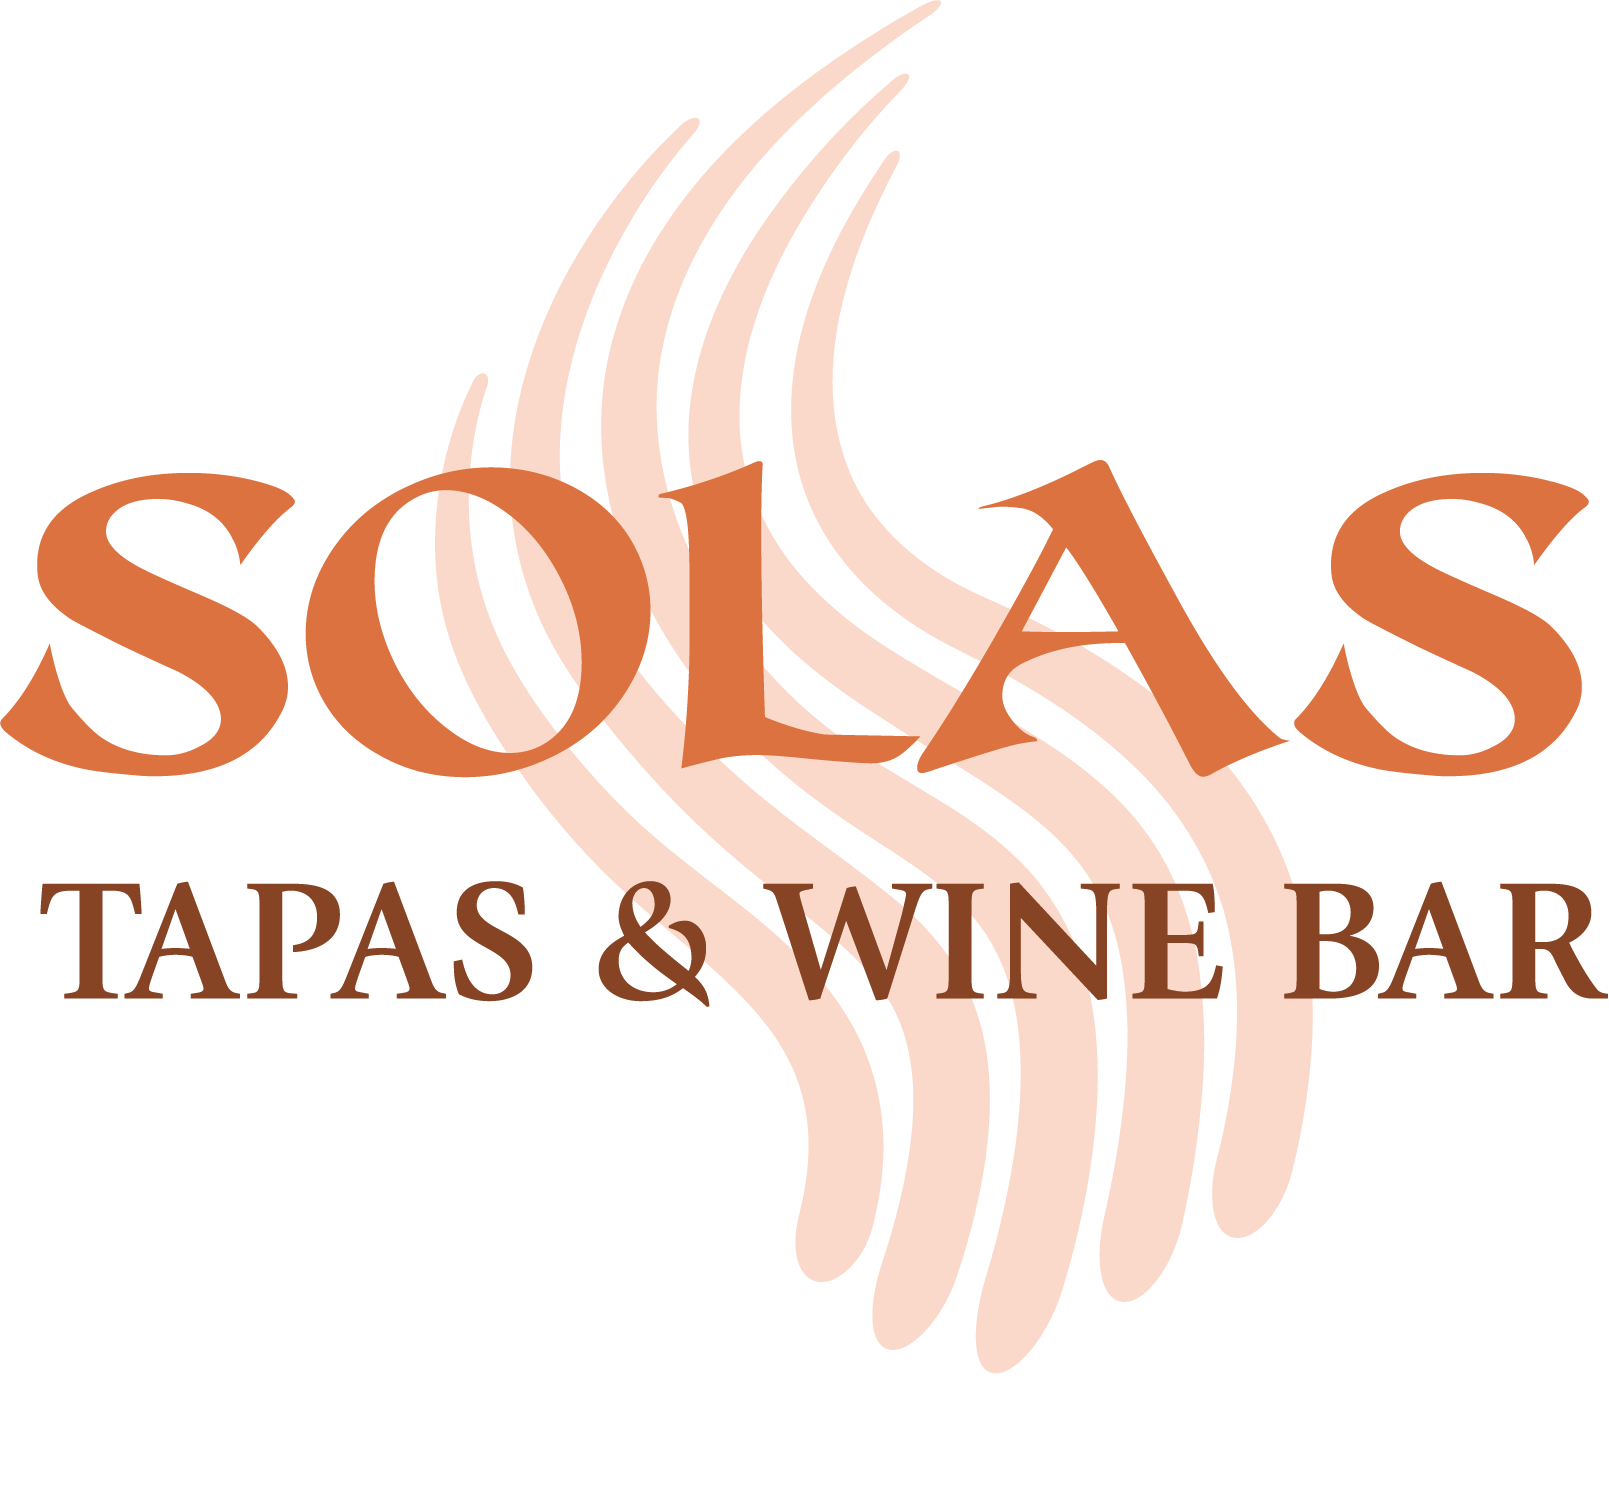 Solas Tapa & Wine Bar - Logo 2.png